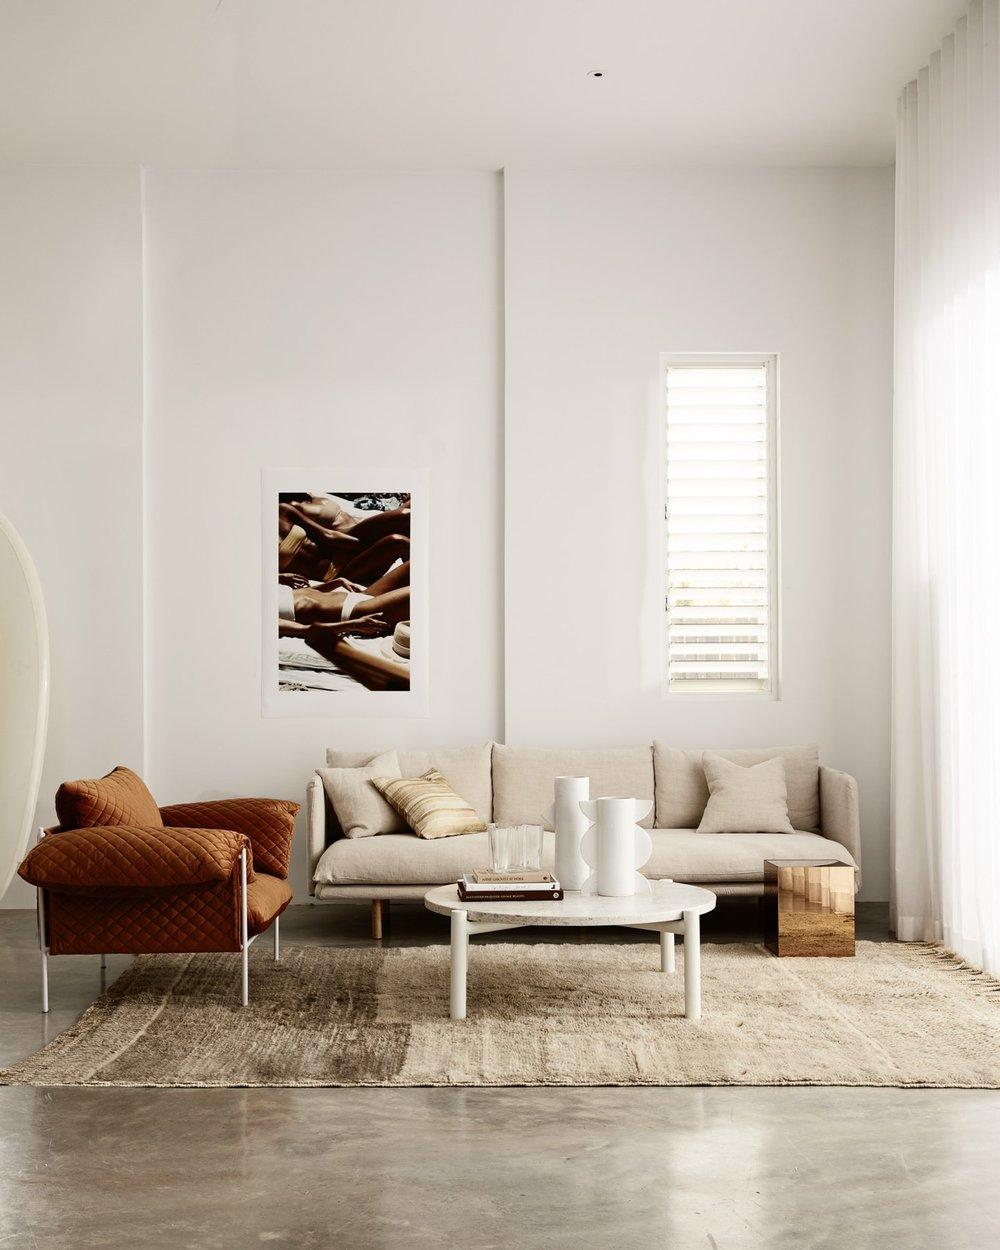 sarahellison-style-SE_HOUSE4_aaa4fbba-29a1-480f-8df1-26e23cb3af94_1440x.jpg